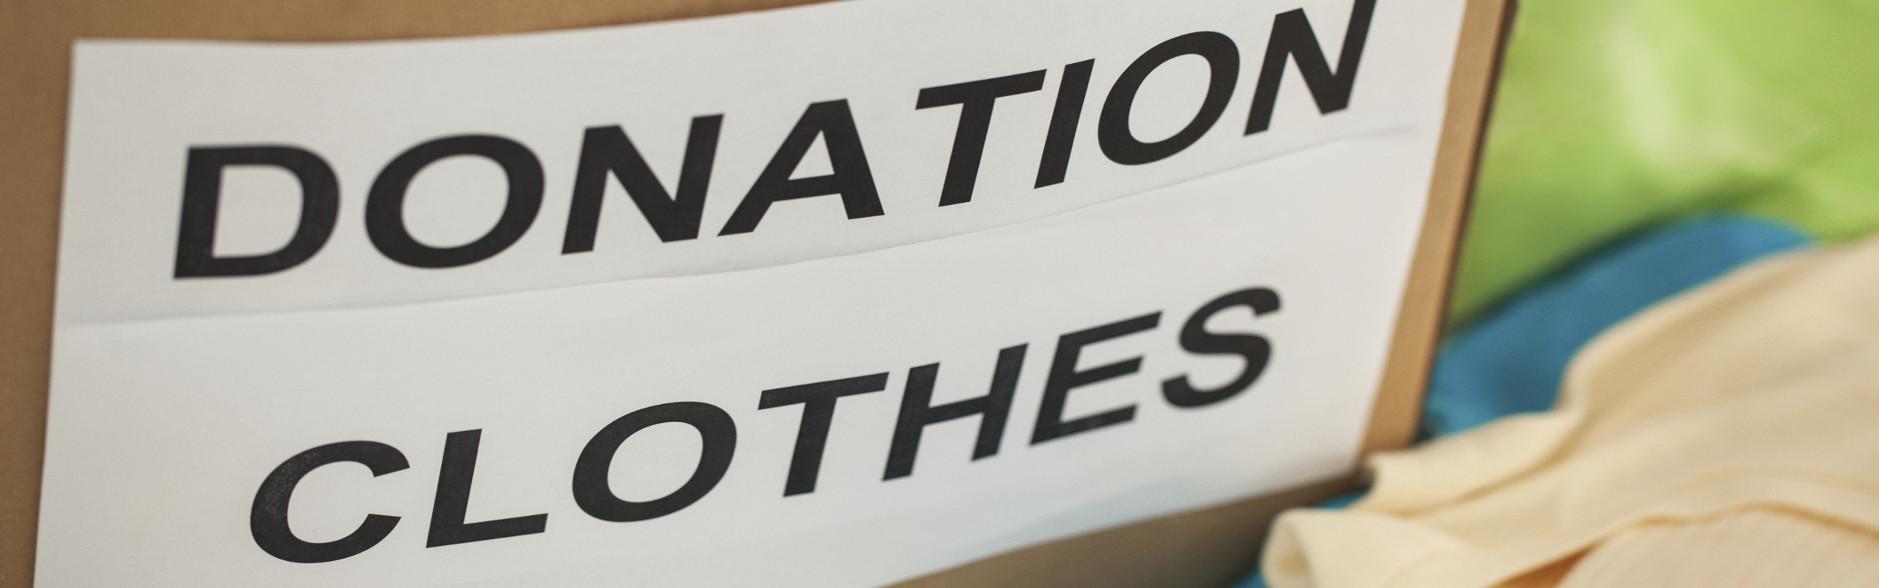 Clothe_Donation_Banner.jpg